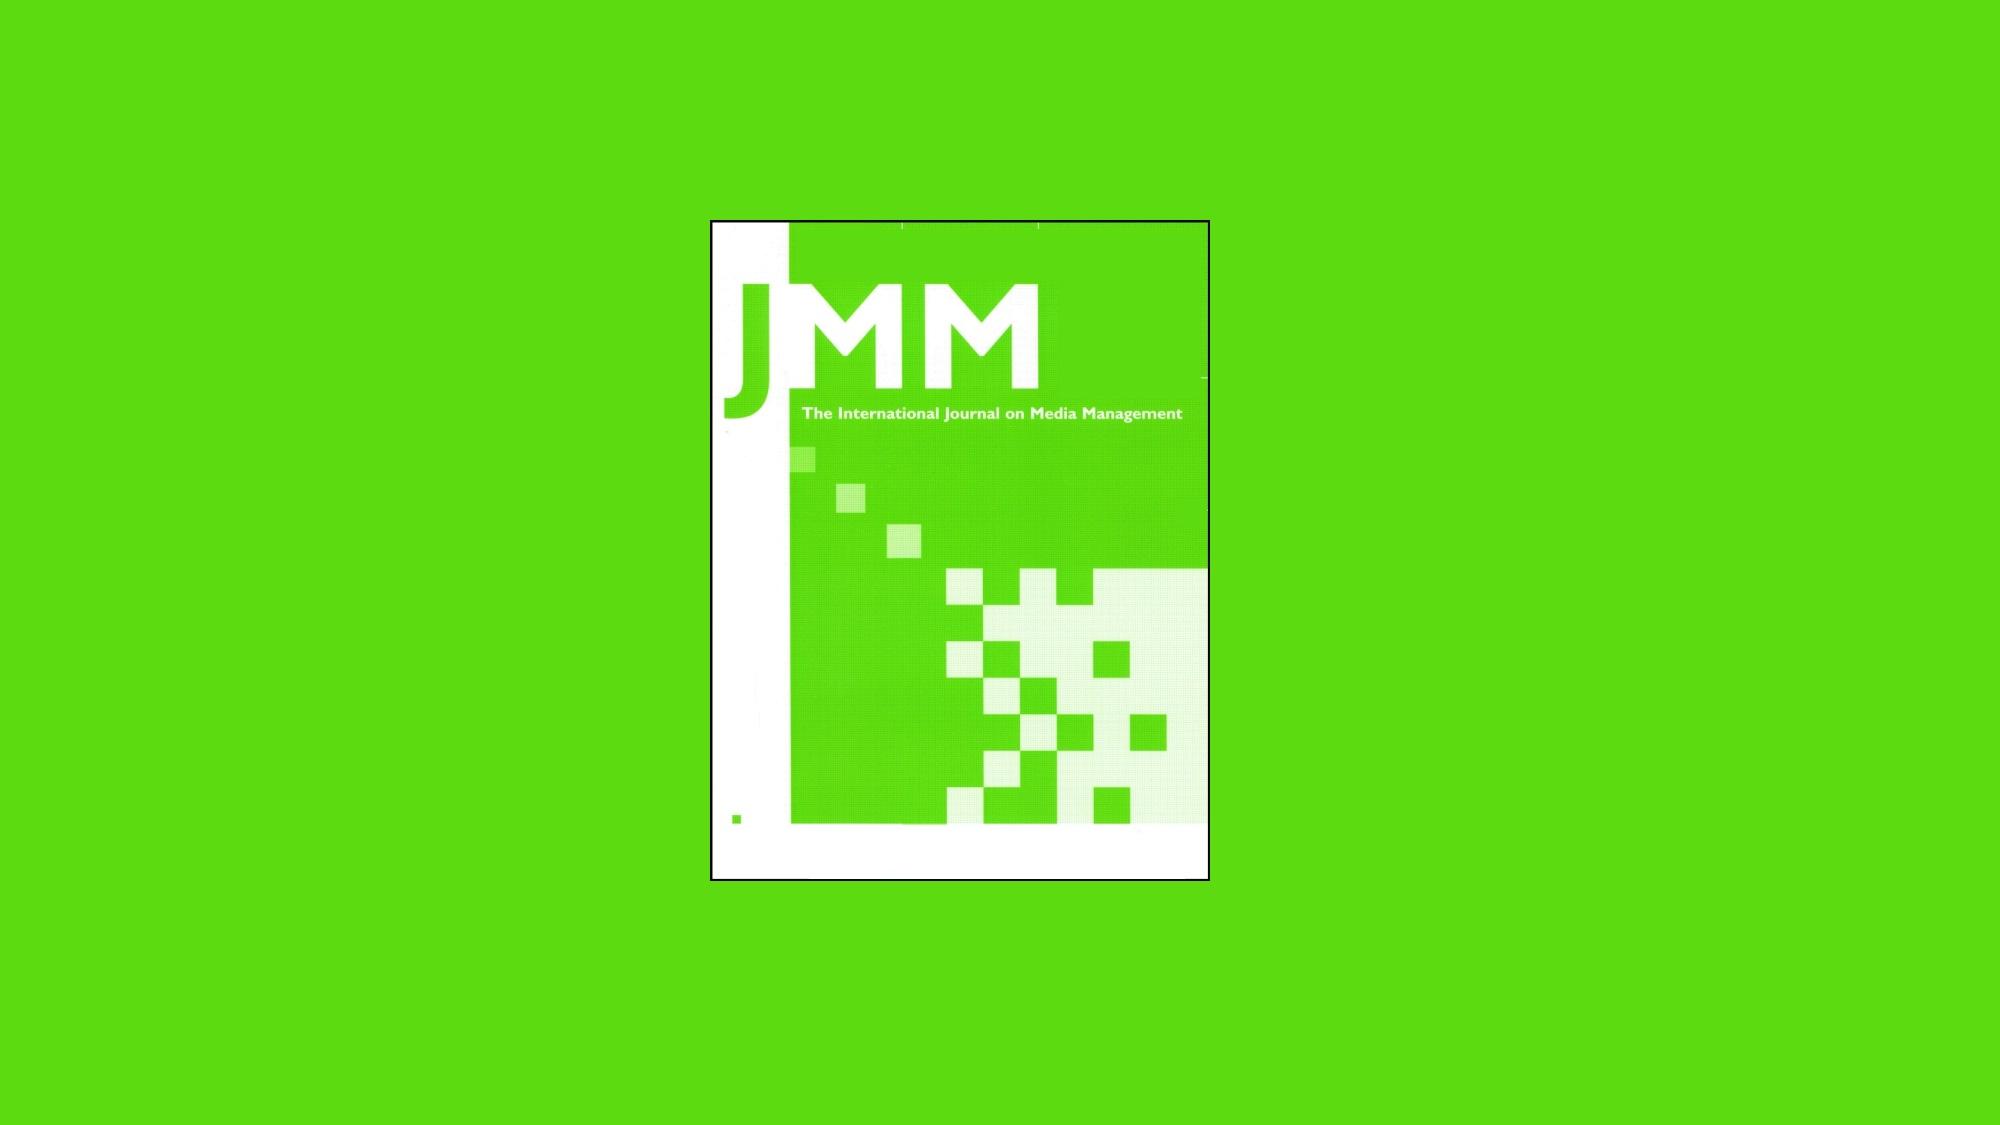 JMM Logo, white on bright green